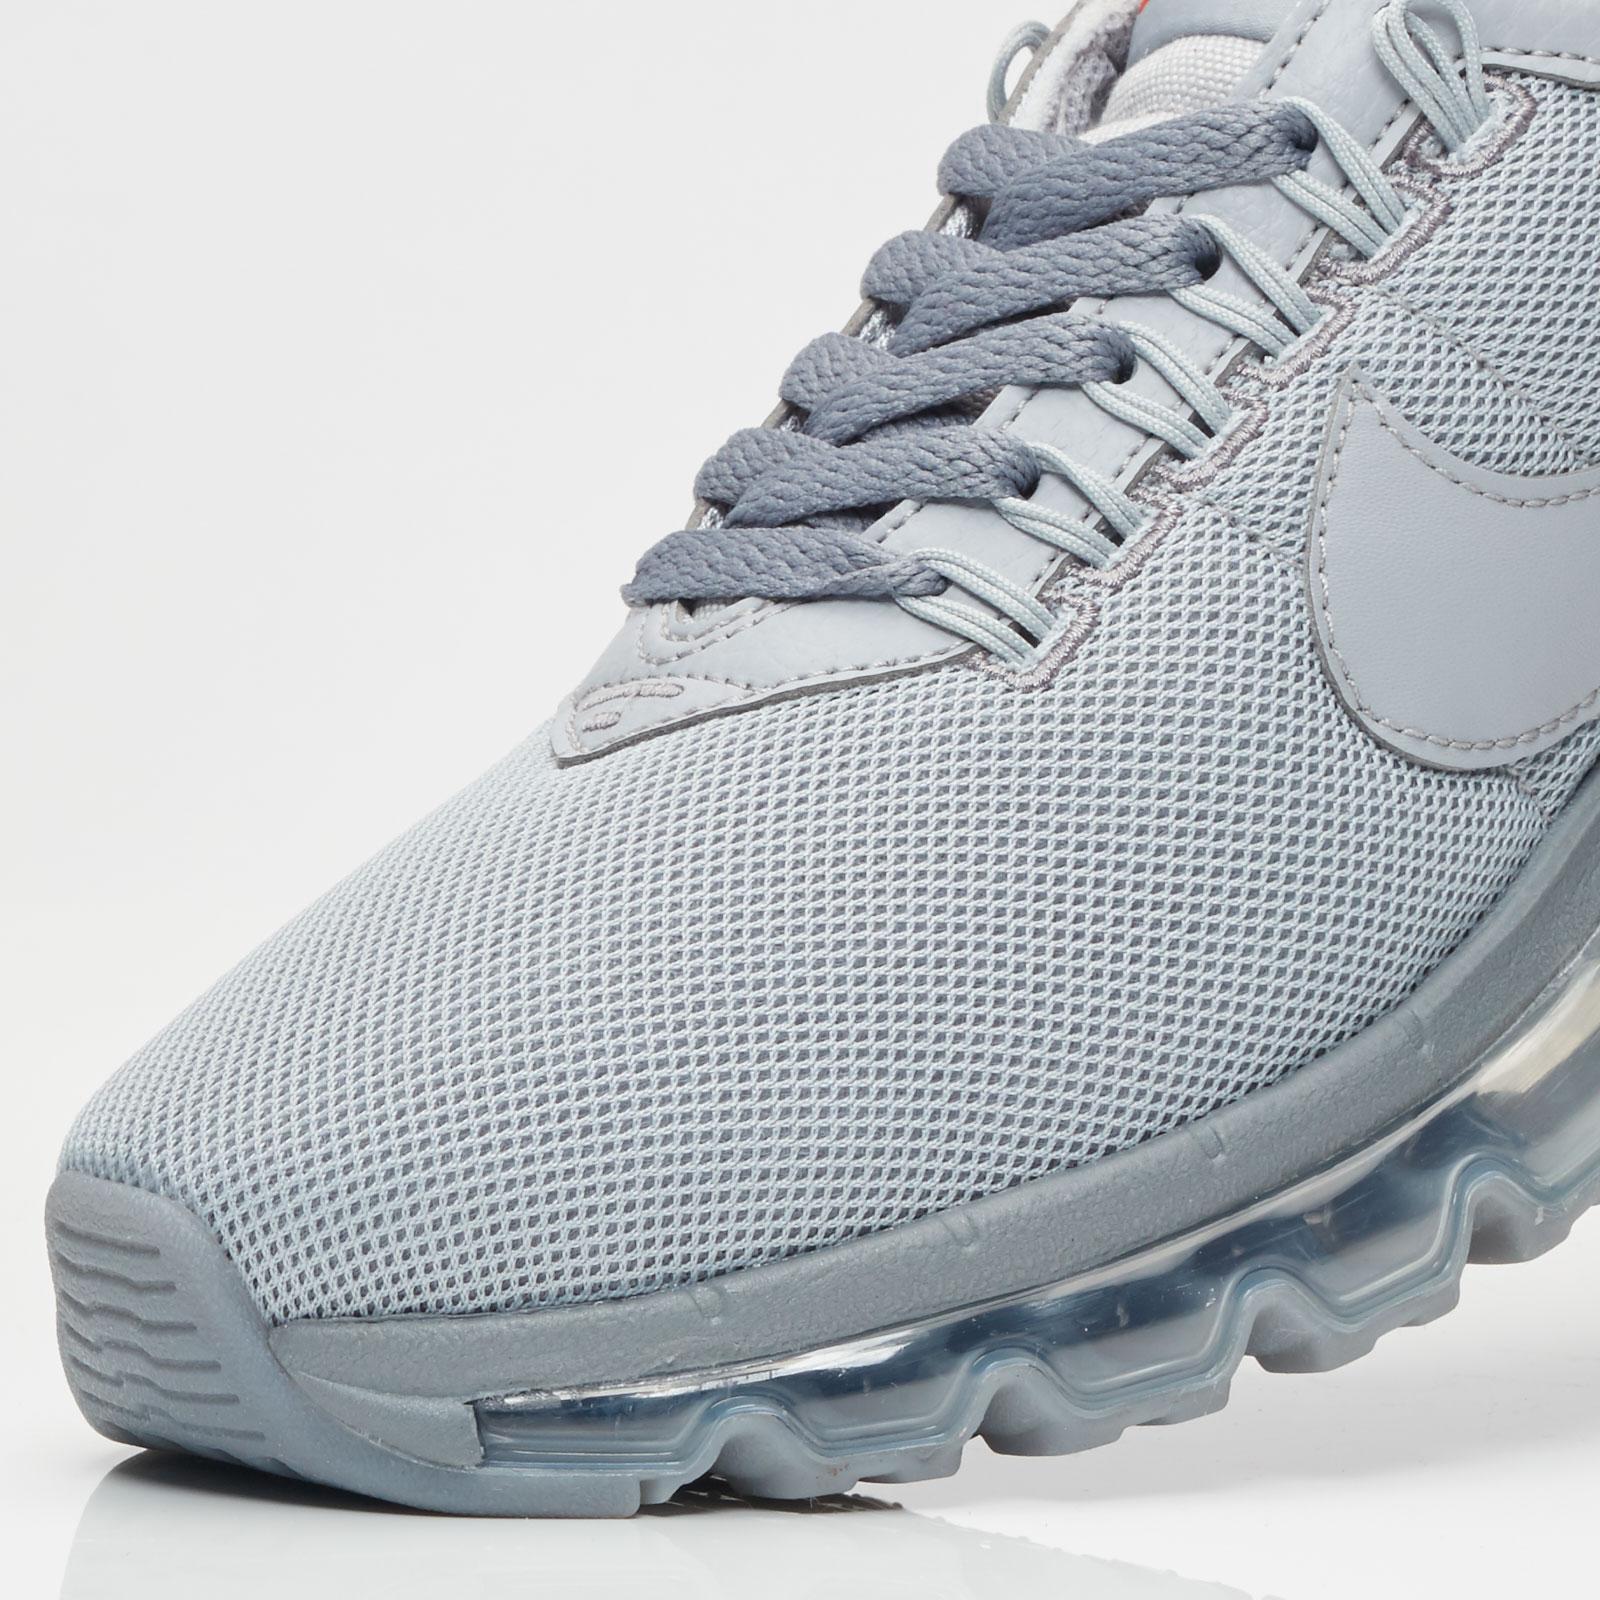 Nike Wmns Air Max Ld Zero 896495 001 Sneakersnstuff I